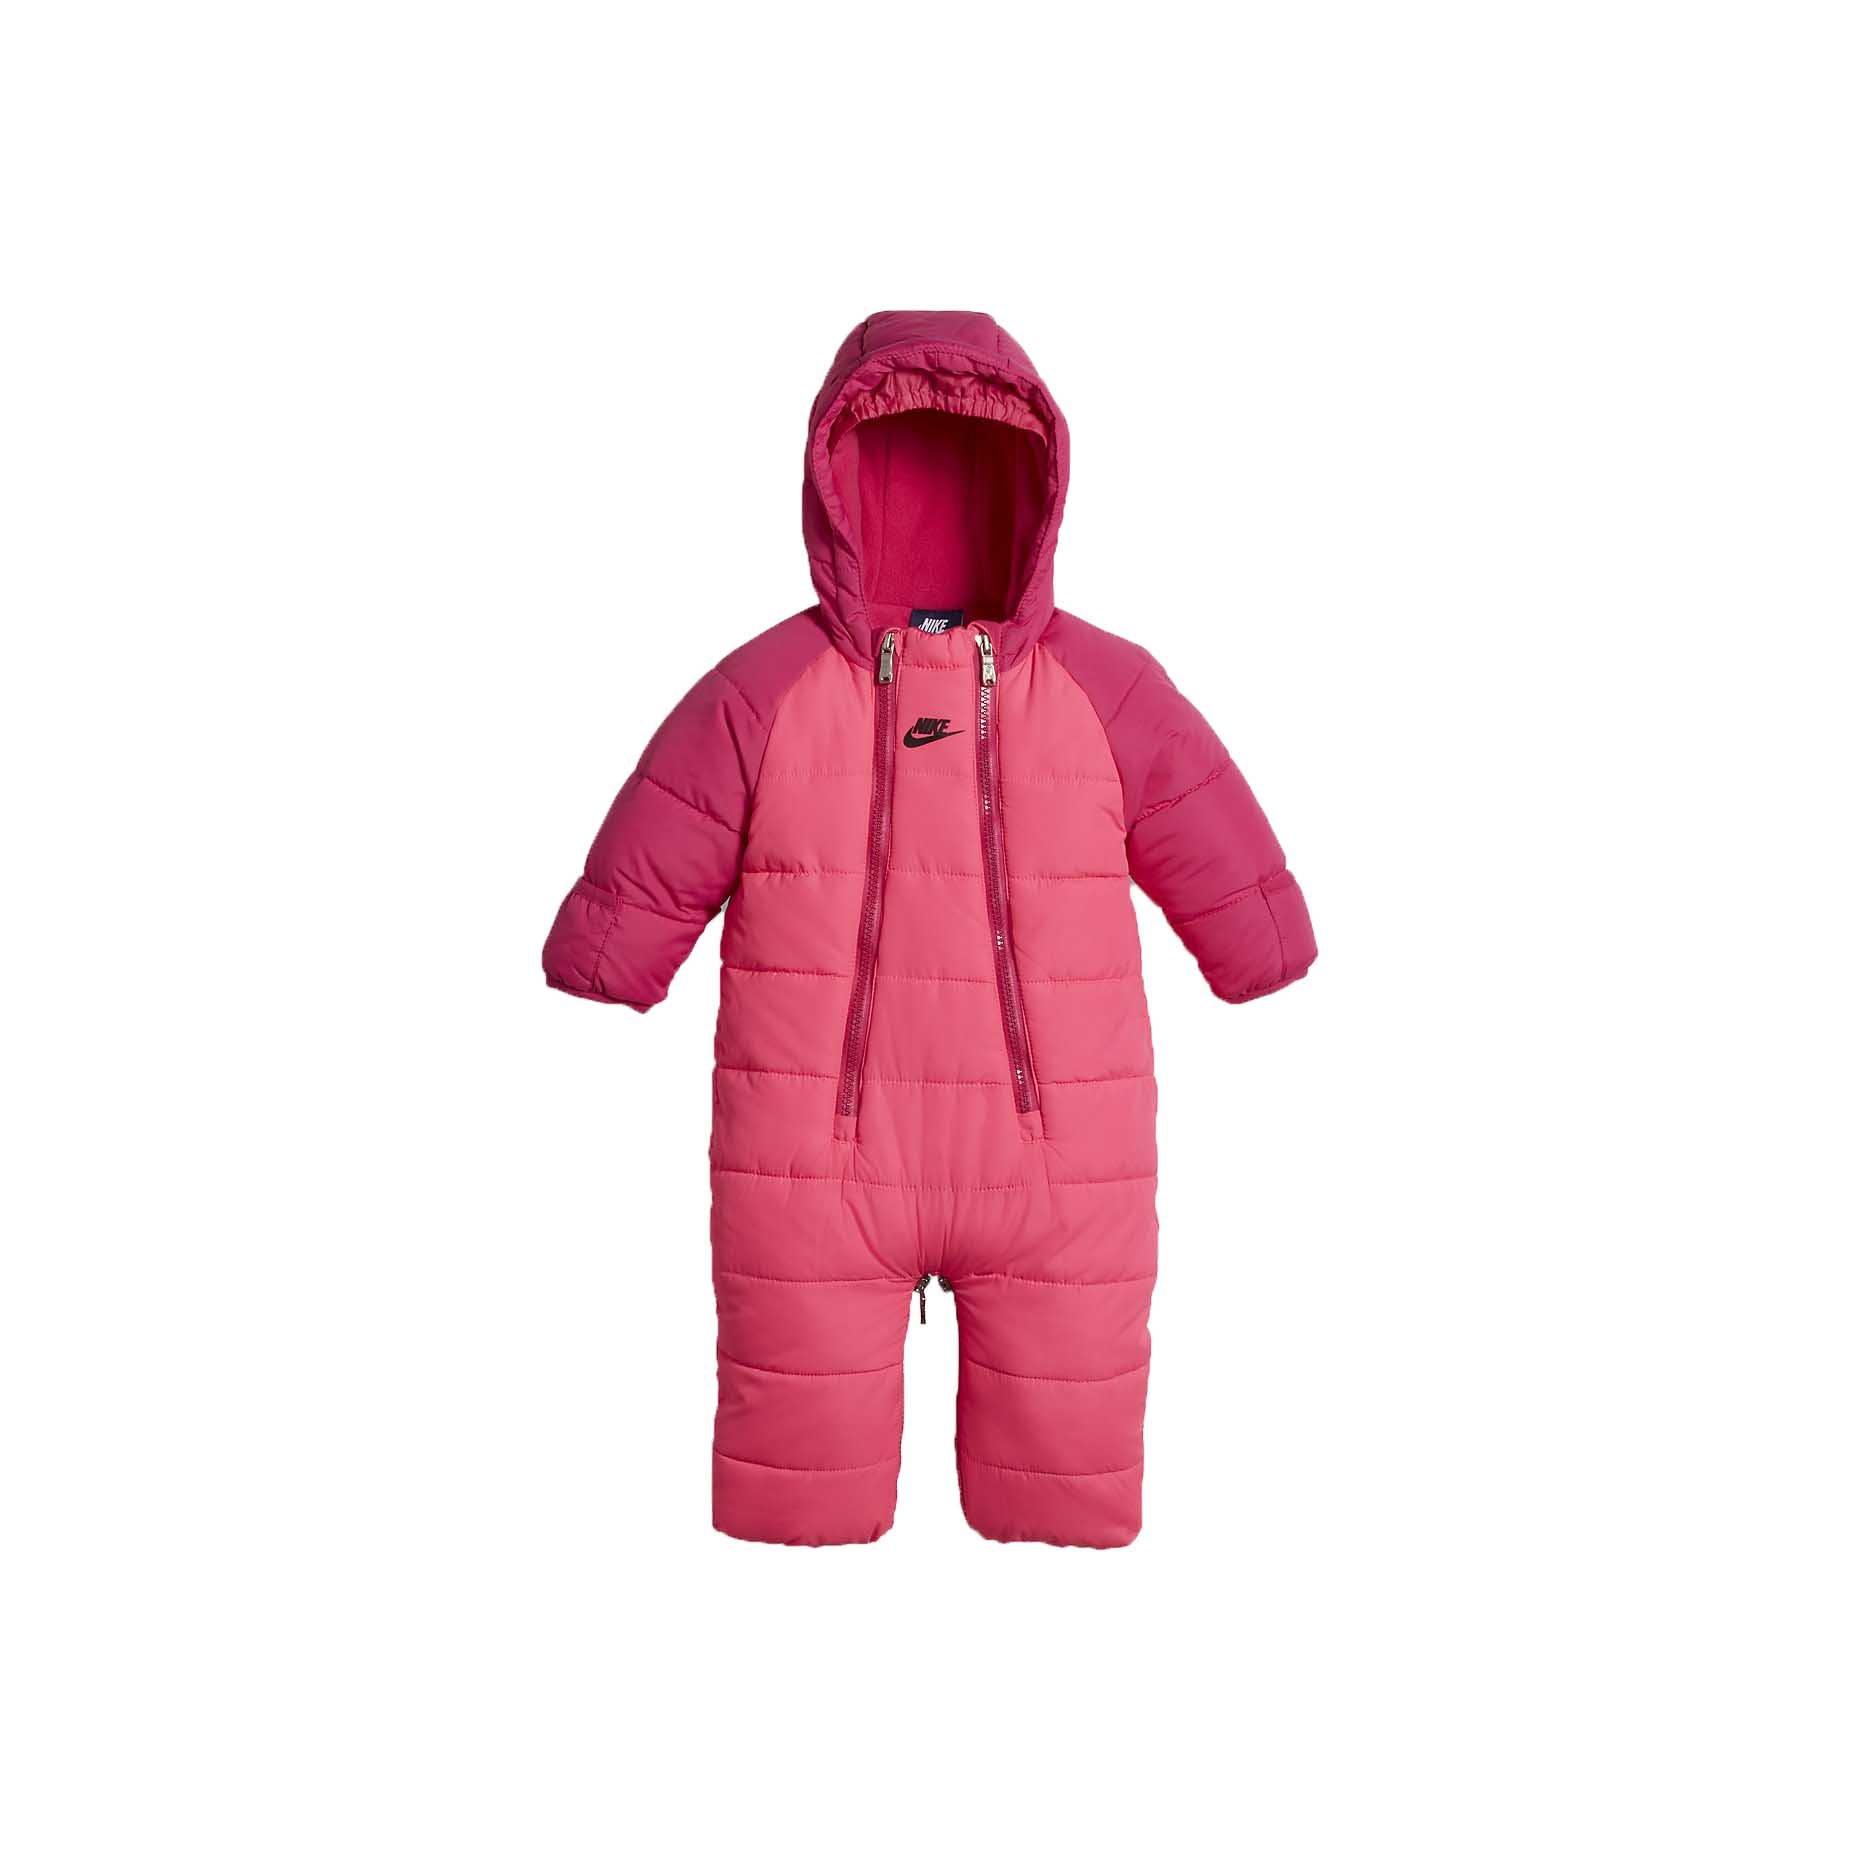 Nike Infant/Toddler Baby Boys' or Baby Girls' Sportswear Convertible Snowsuit